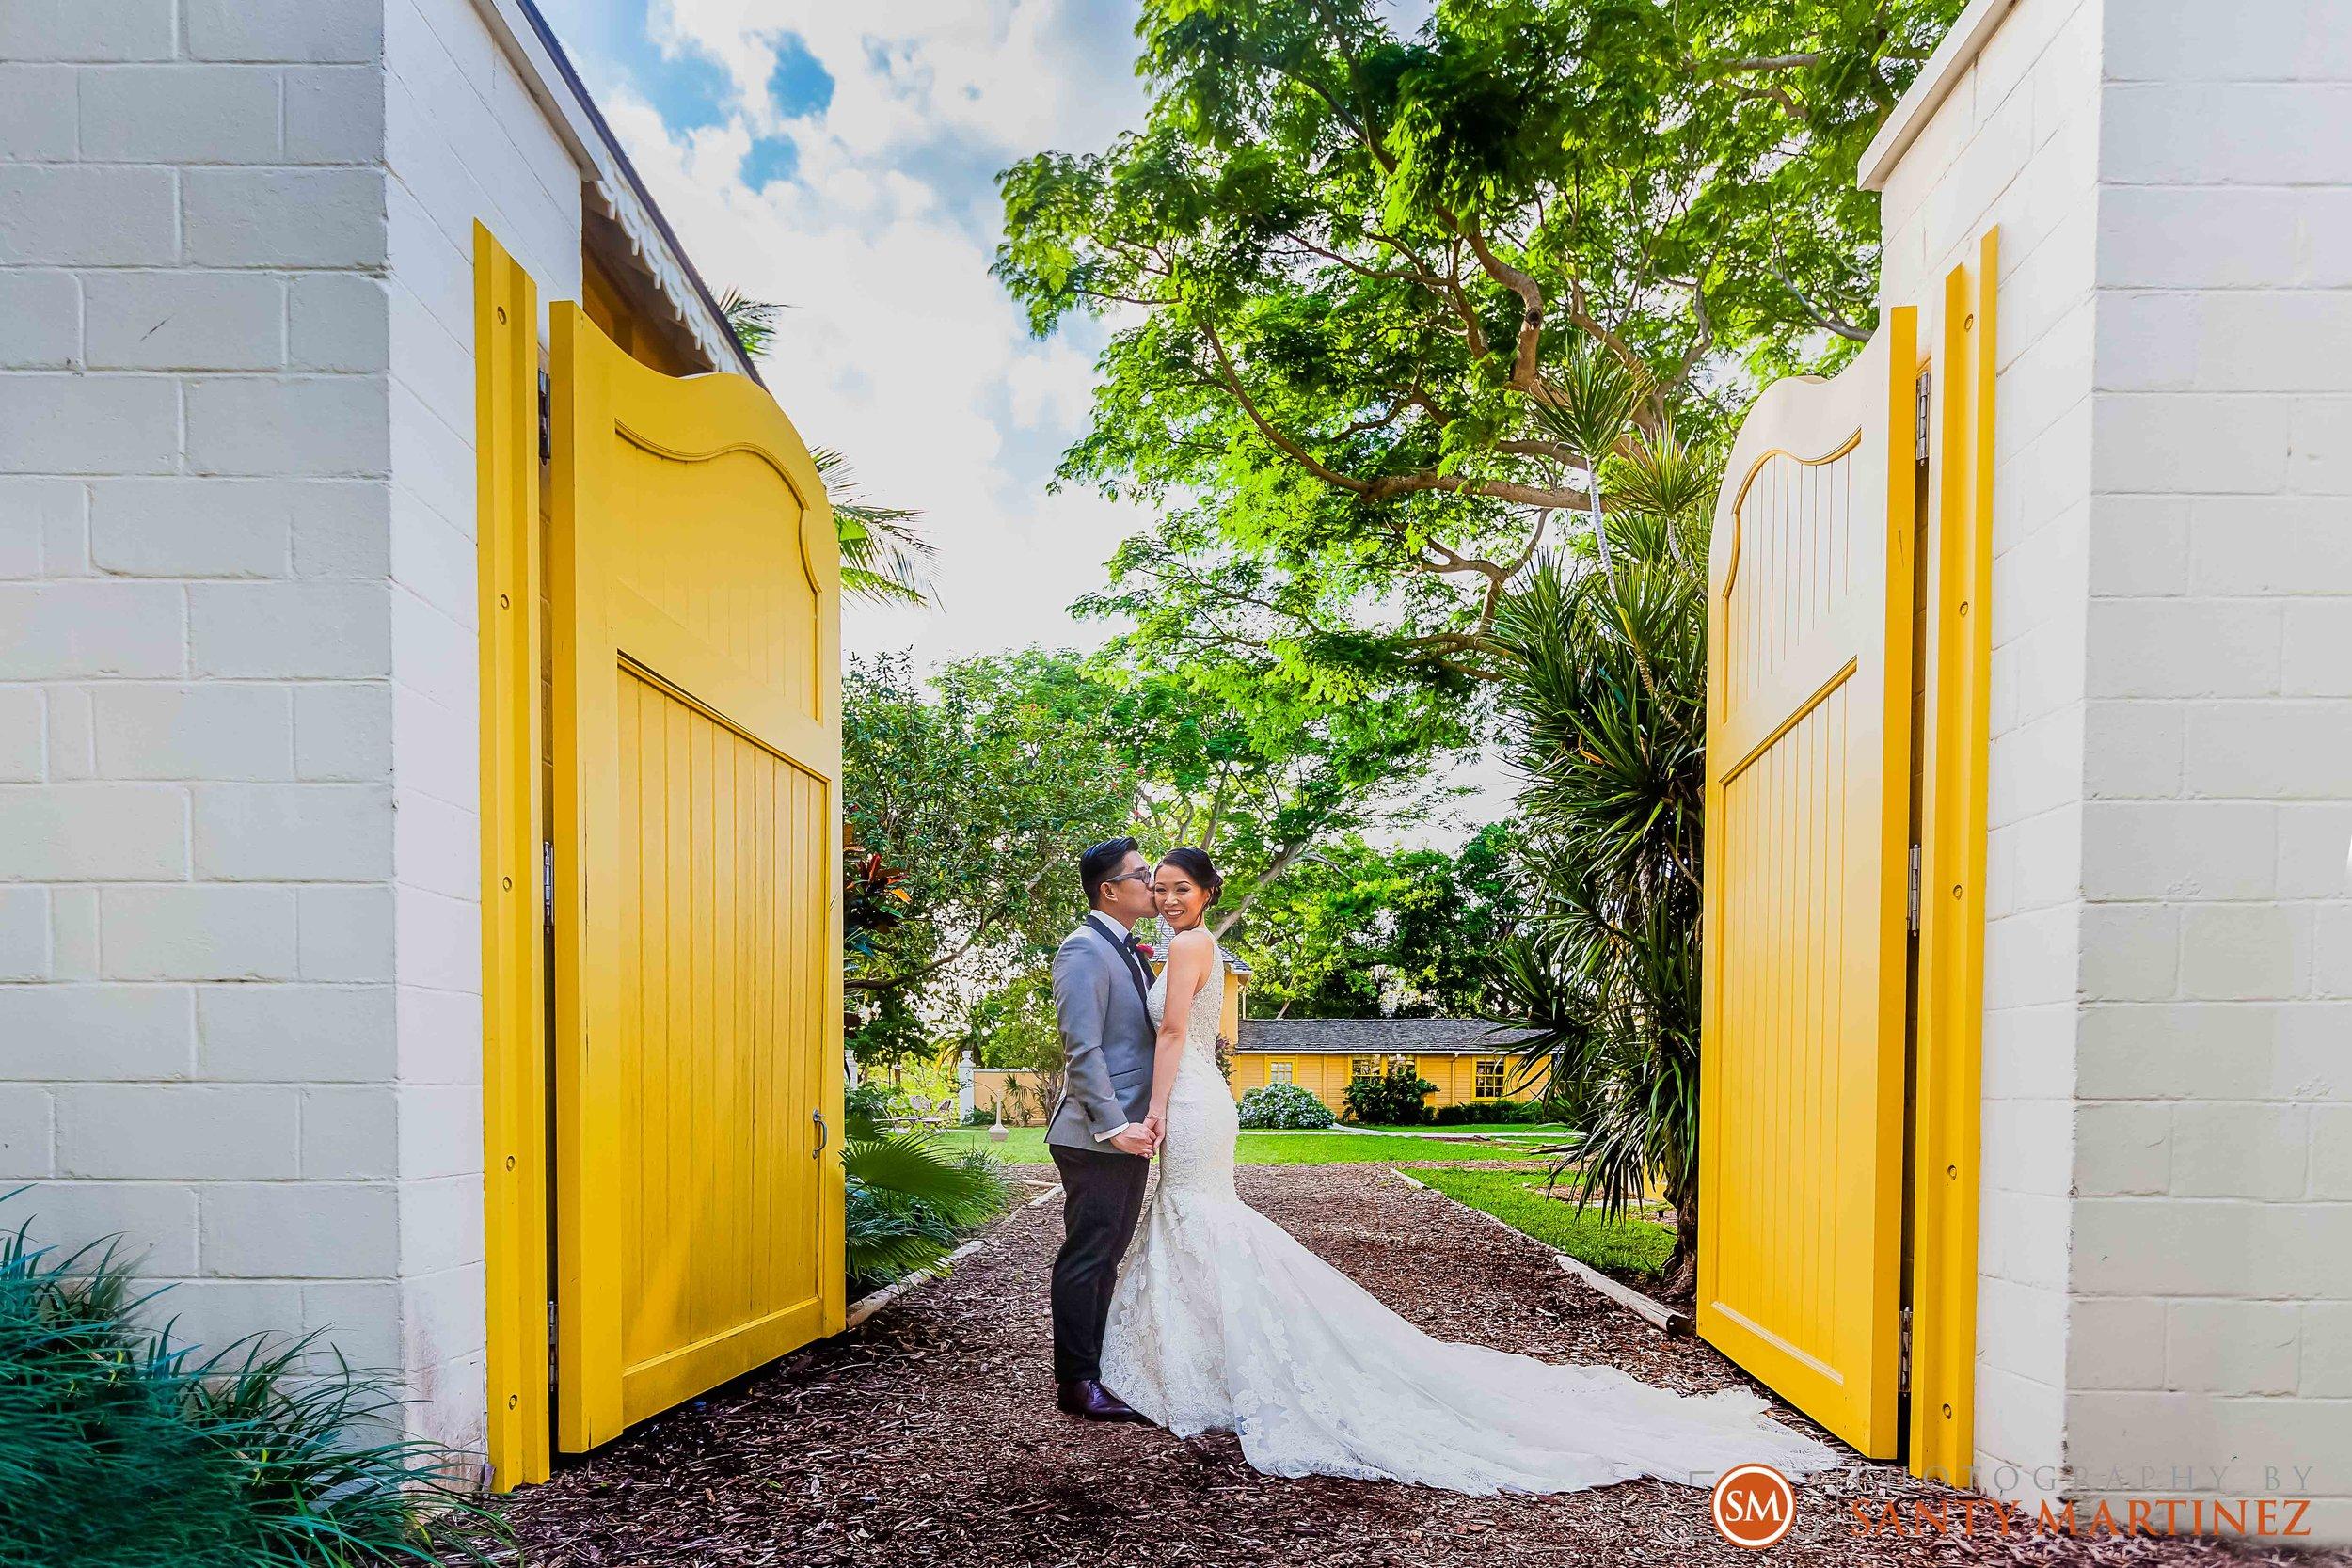 Wedding Bonnet House - Photography by Santy Martinez-14.jpg